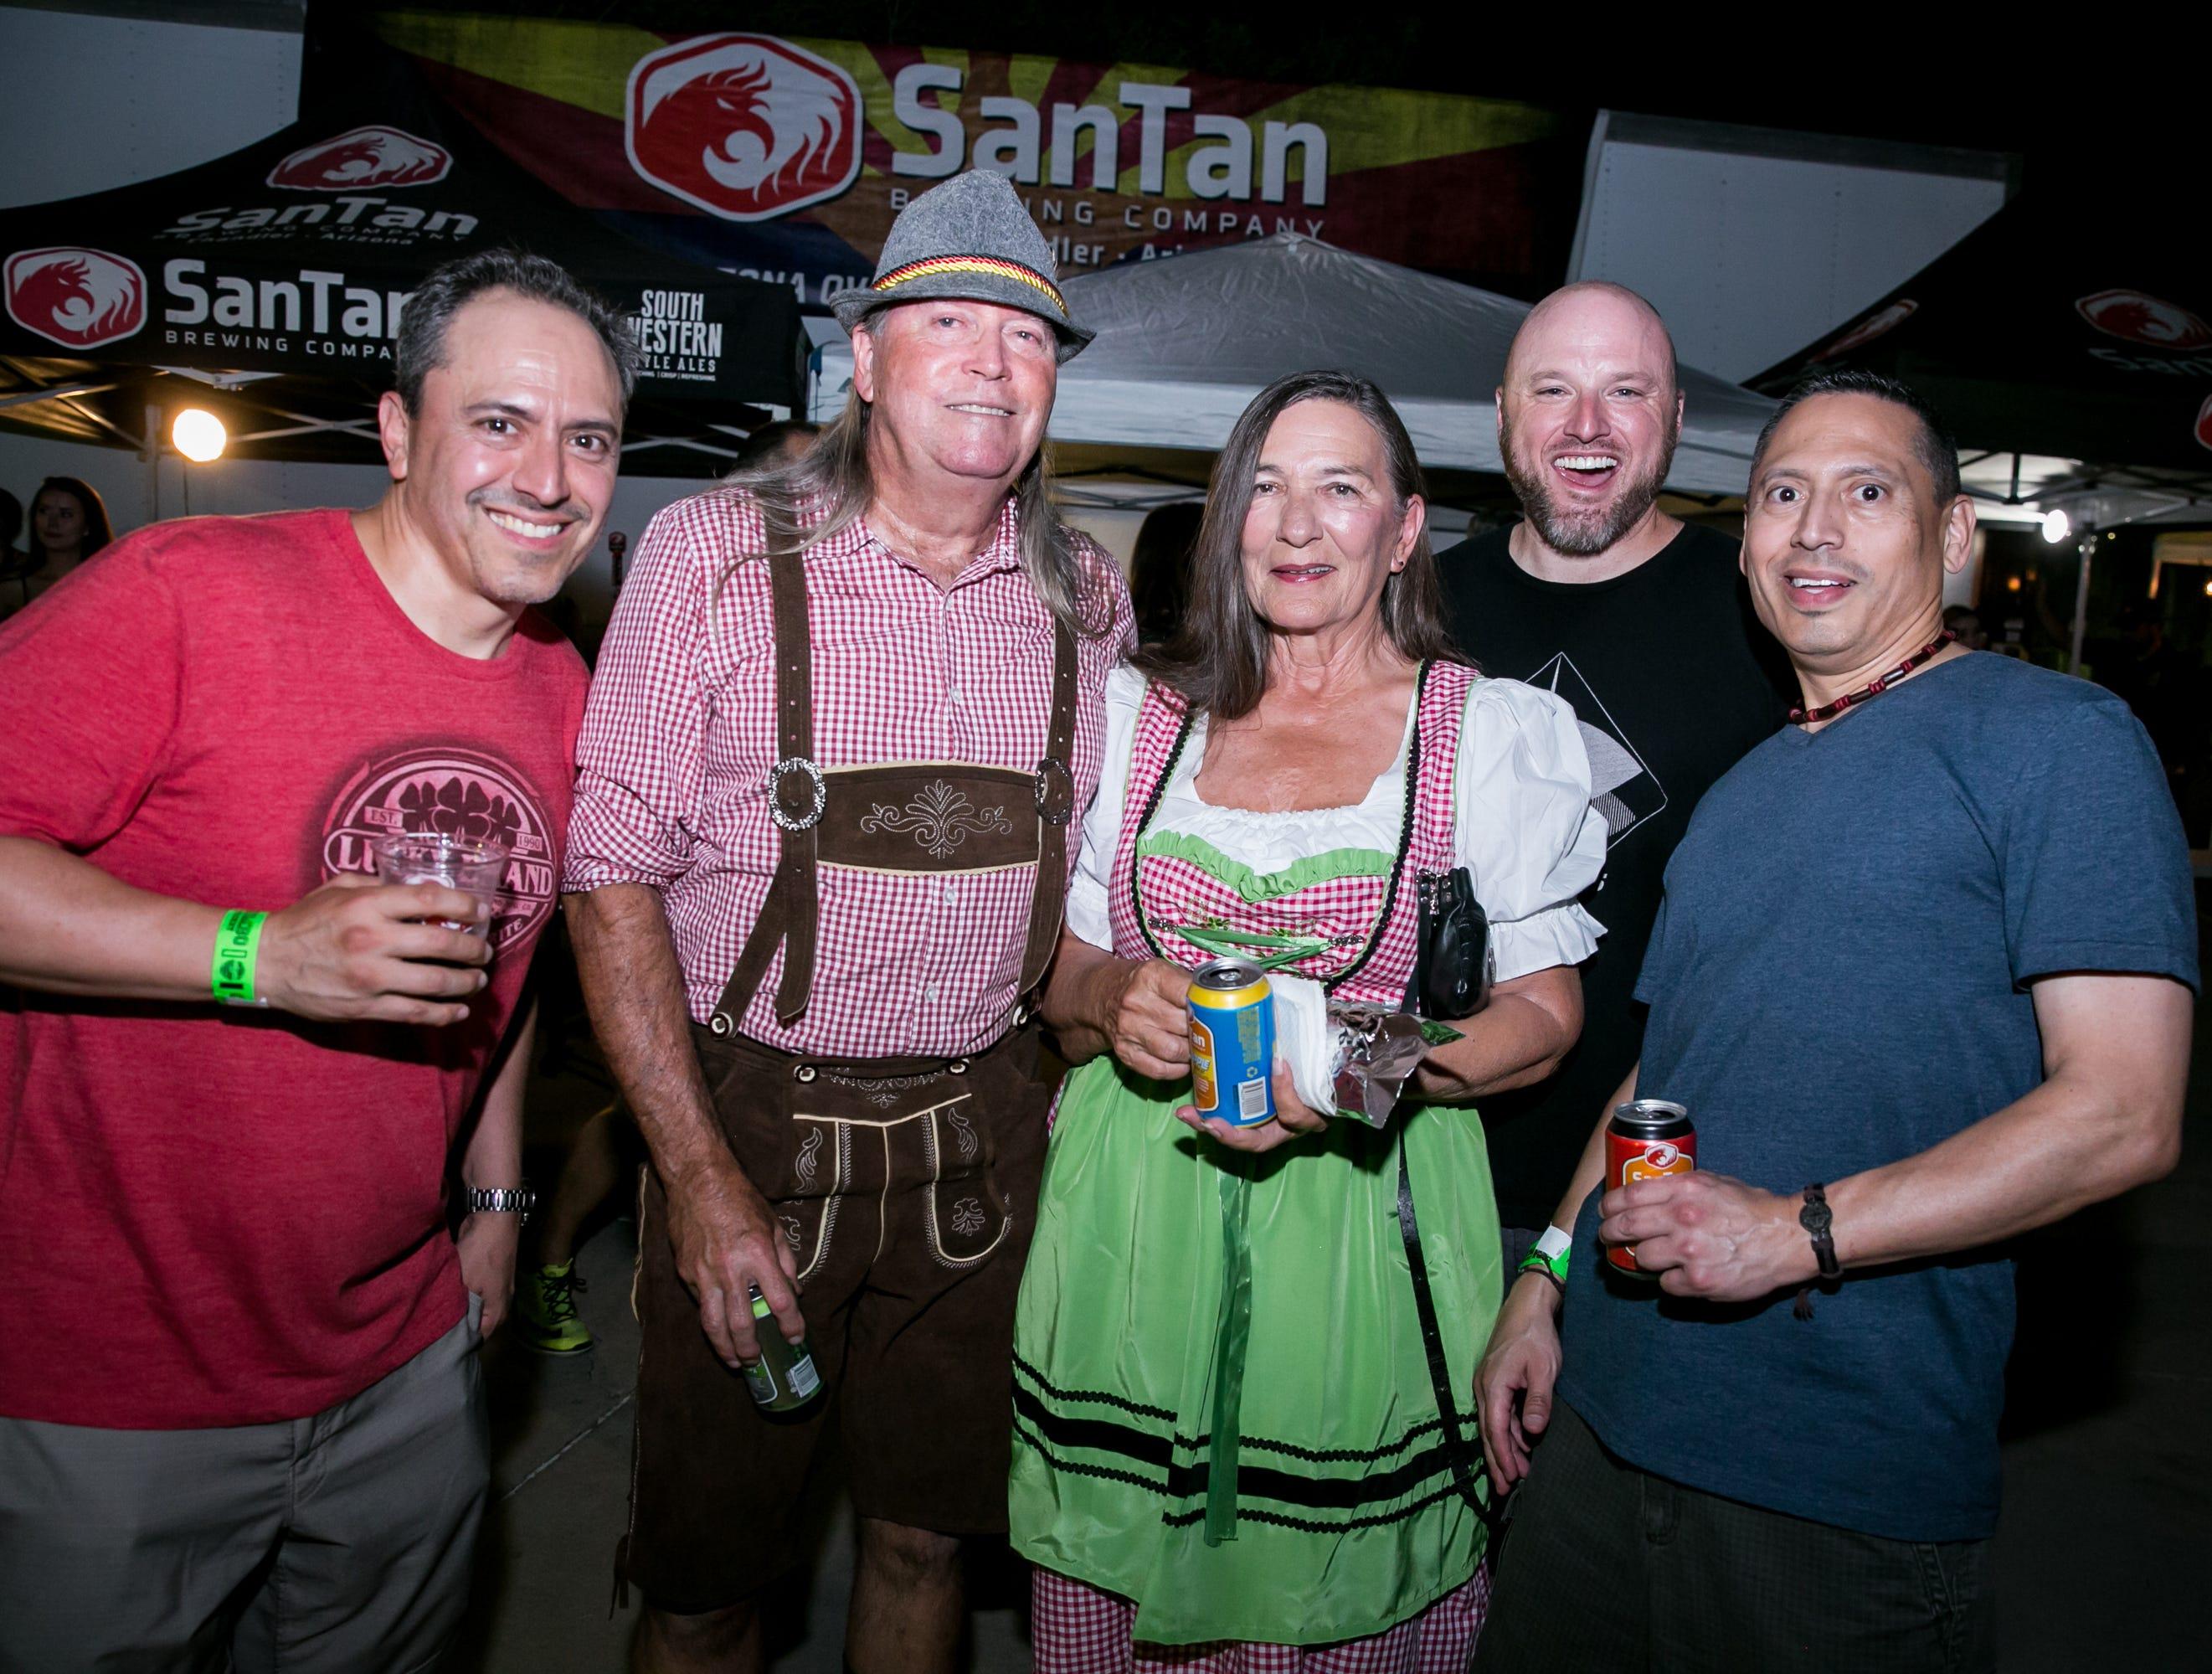 The crowd got festive during SanTan Brewing Oktoberfest at Dr. AJ Chandler Park in Chandler on Saturday, September 29, 2018.